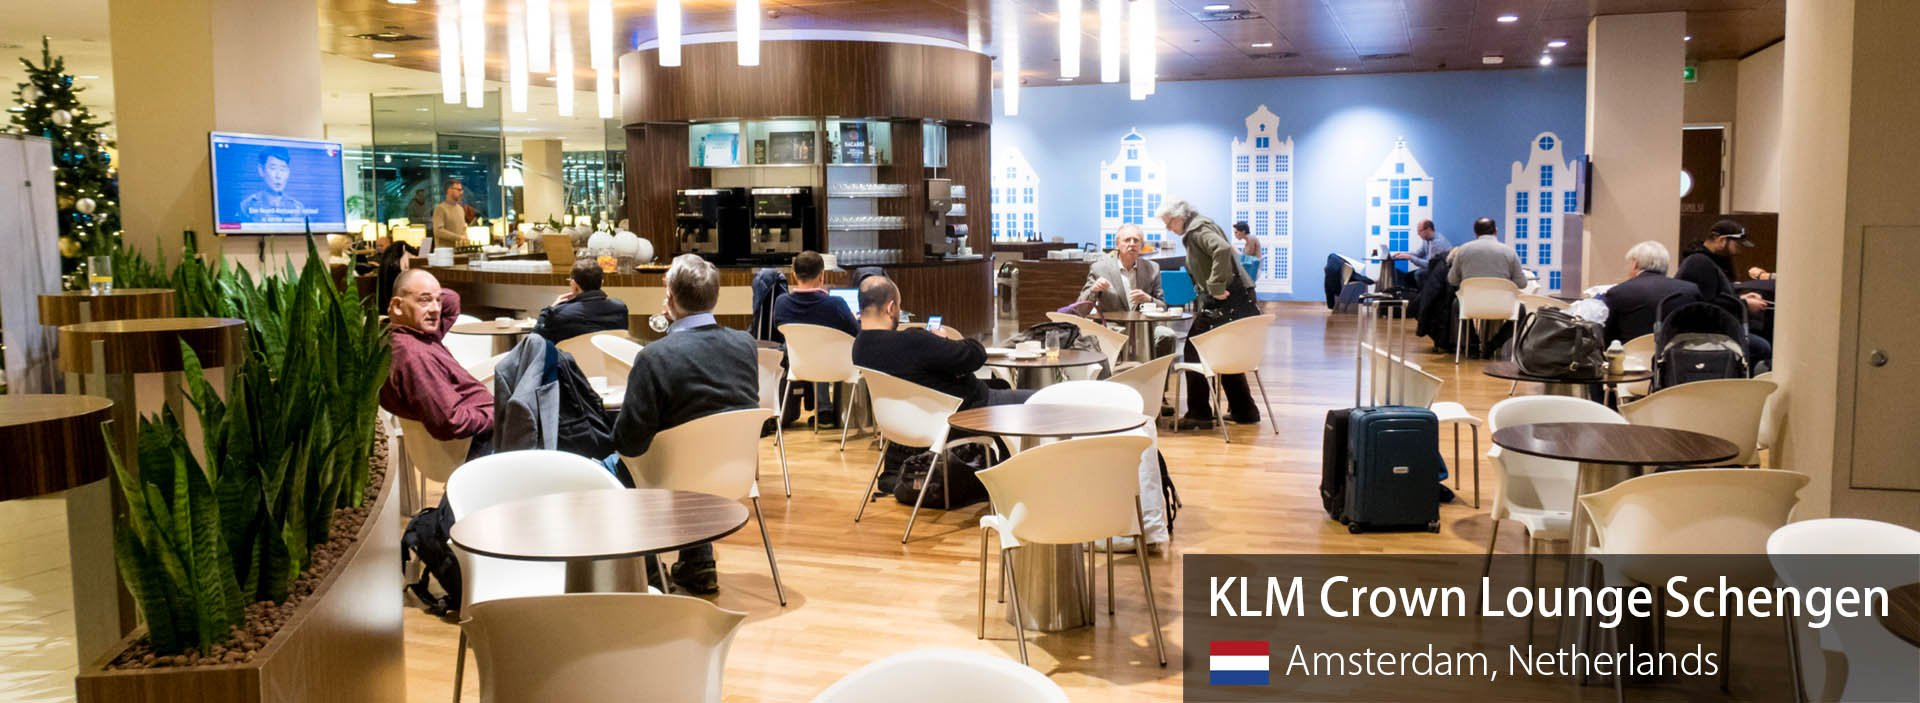 Lounge Review: KLM Crown Lounge Schengen at Amsterdam Schiphol